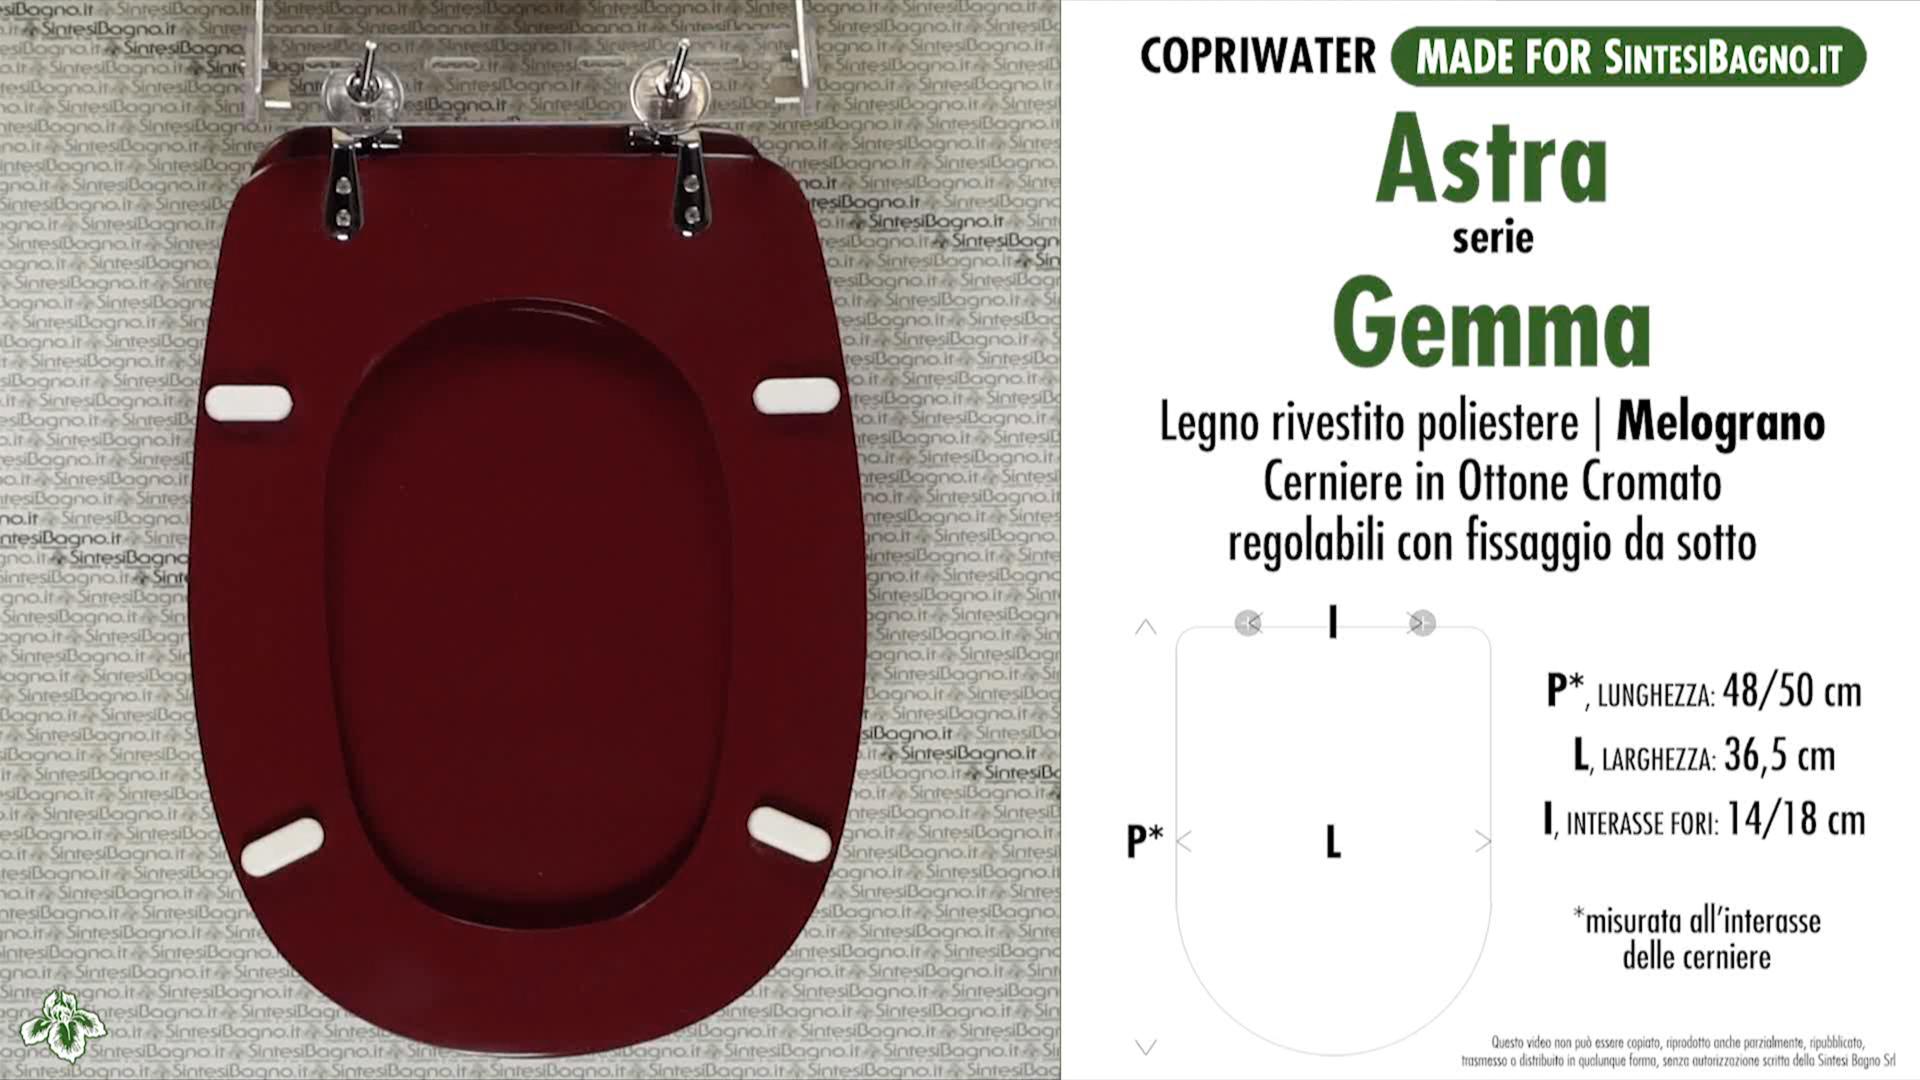 SCHEDA TECNICA MISURE copriwater ASTRA GEMMA